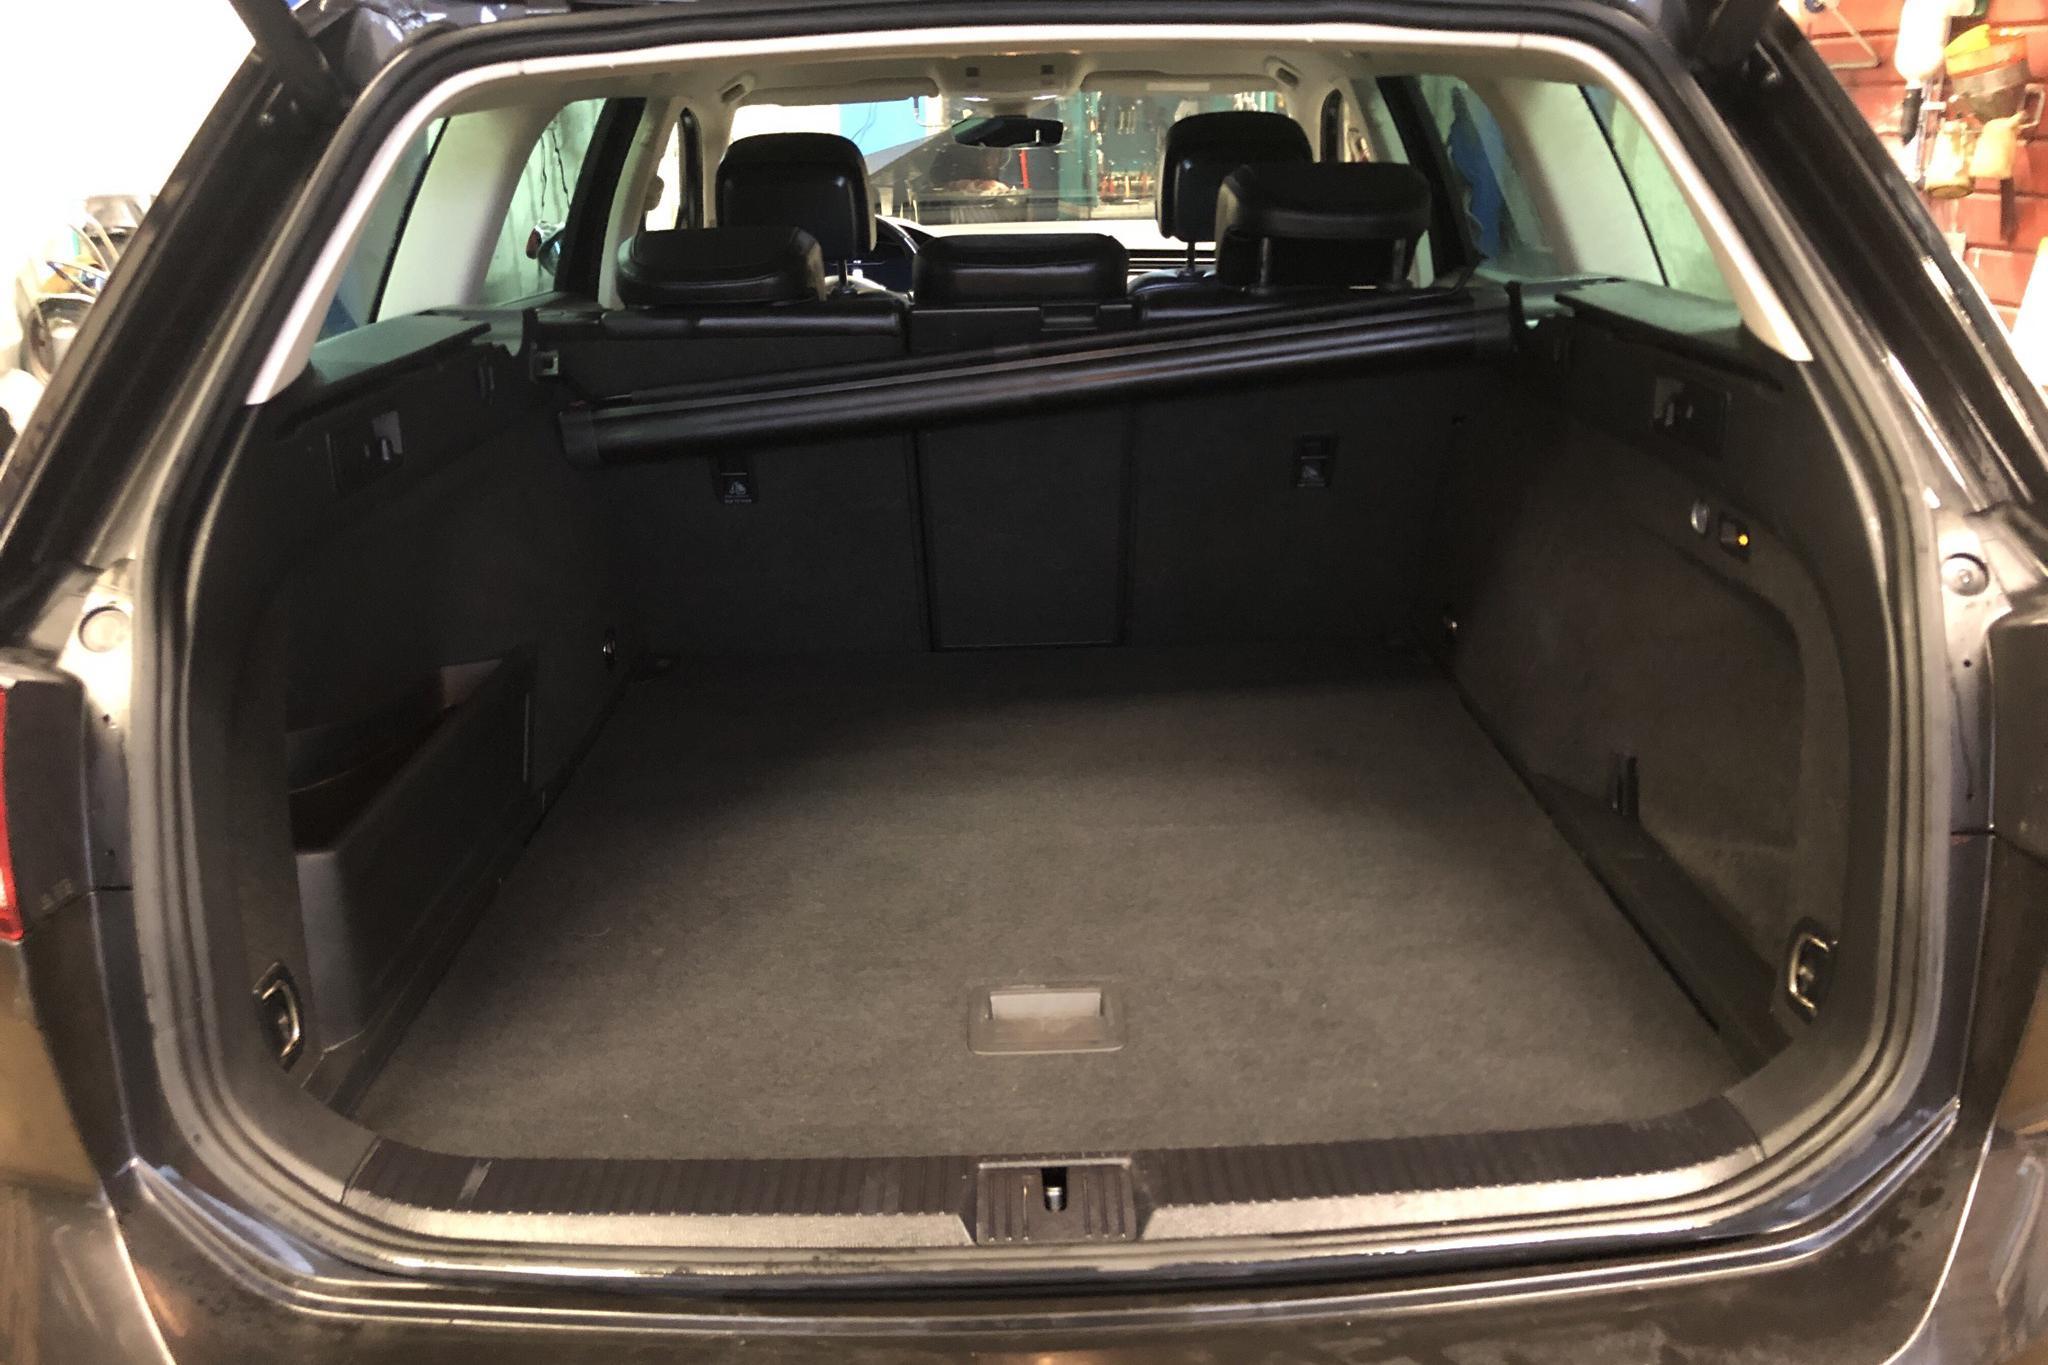 VW Passat Alltrack 2.0 TDI Sportscombi 4MOTION (190hk) - 11 956 mil - Automat - Dark Grey - 2018